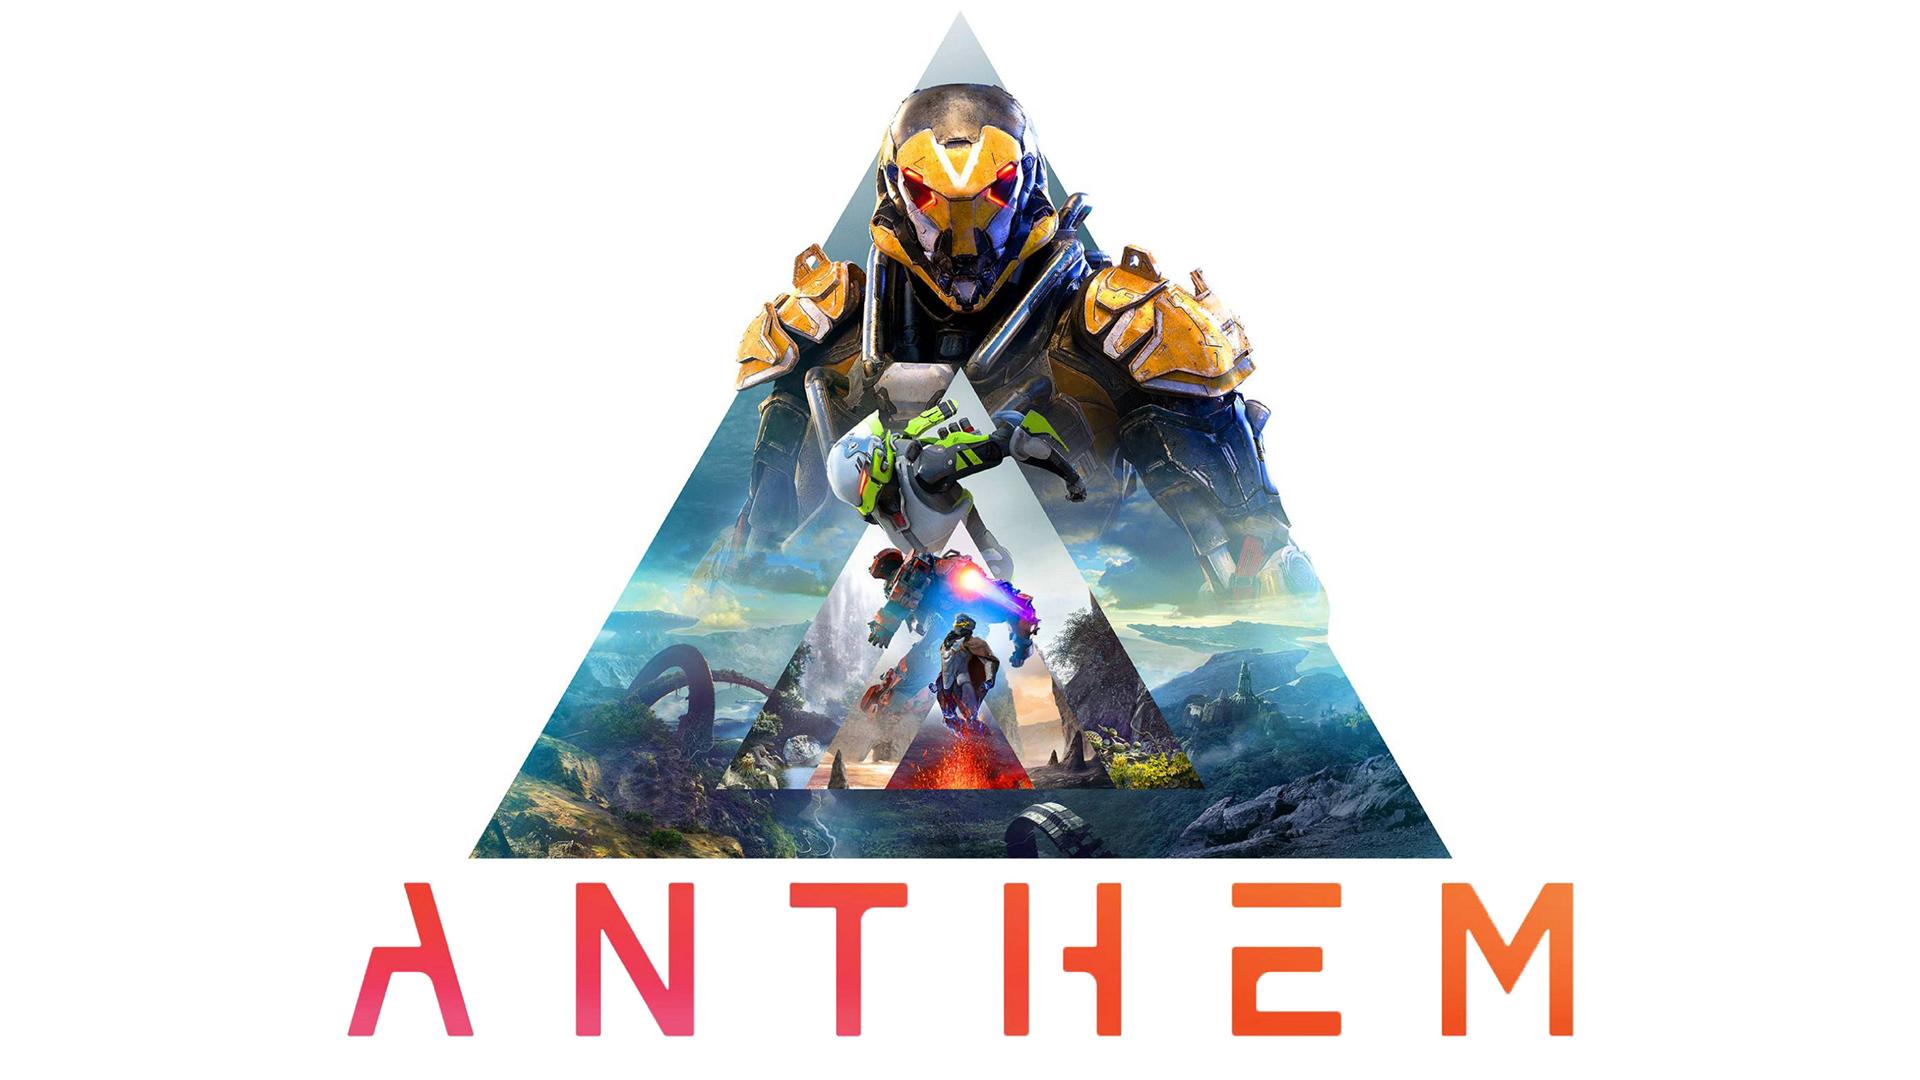 Anthem (Origin key | RU) 2019